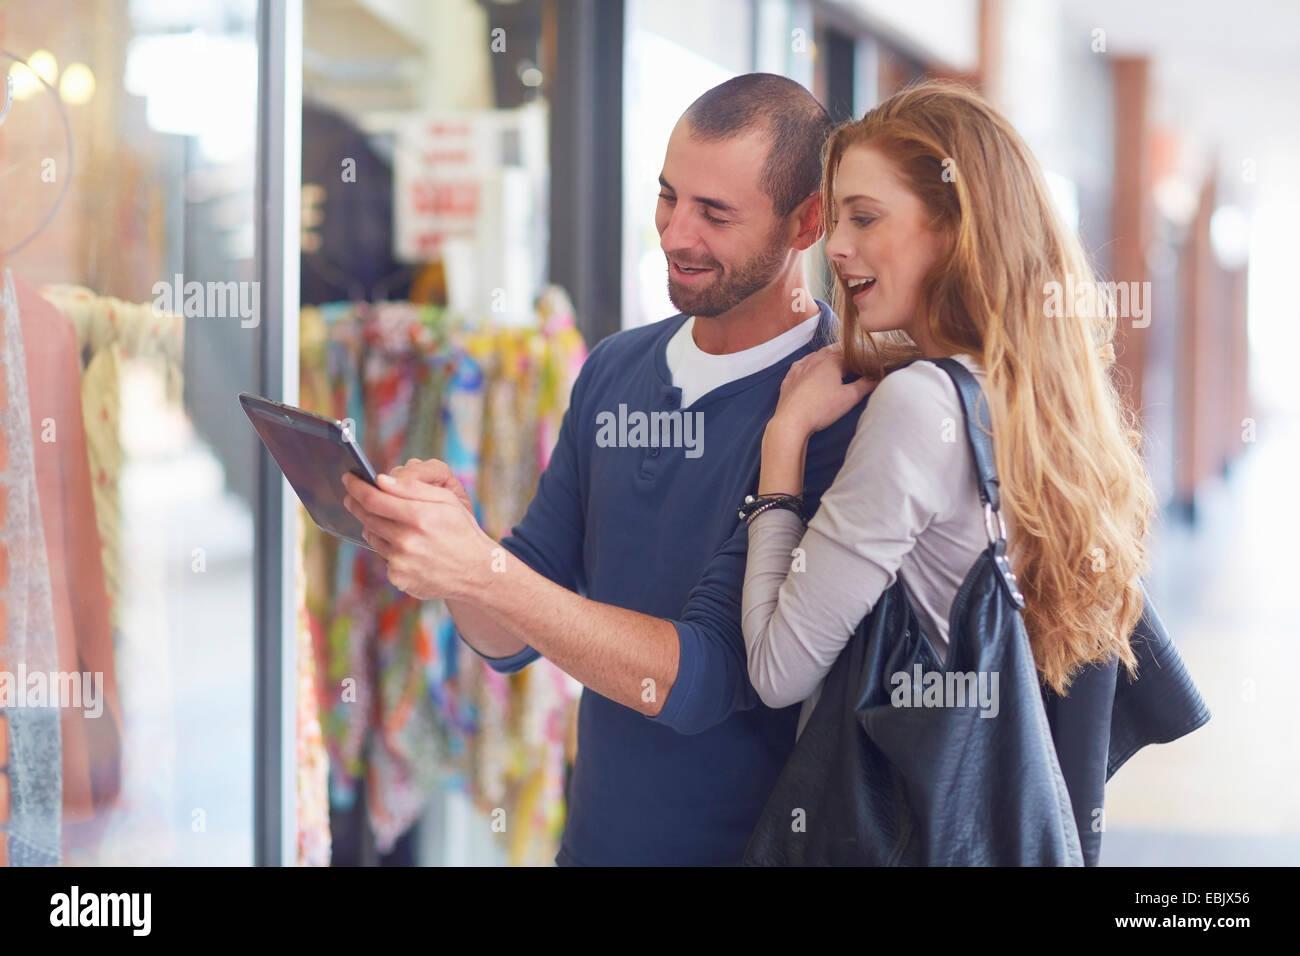 Couple window shopping, holding digital tablet Photo Stock